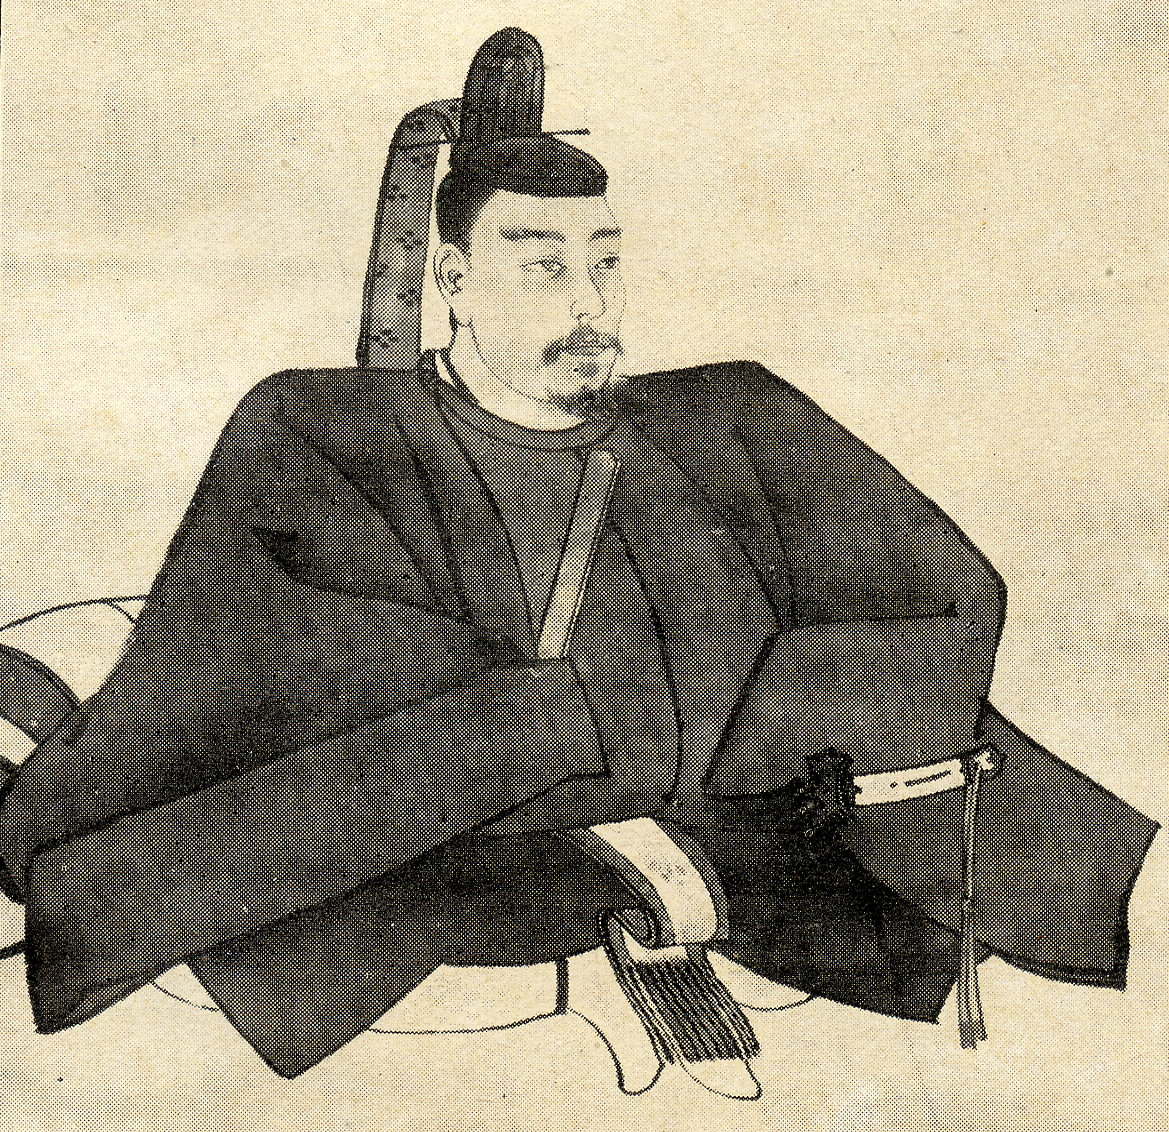 minamoto yuritomo essay - backup - wikipedia heian  the kamakura period began in 1185 when minamoto no yoritomo seized power from the emperors and established a  and essays, literacy.